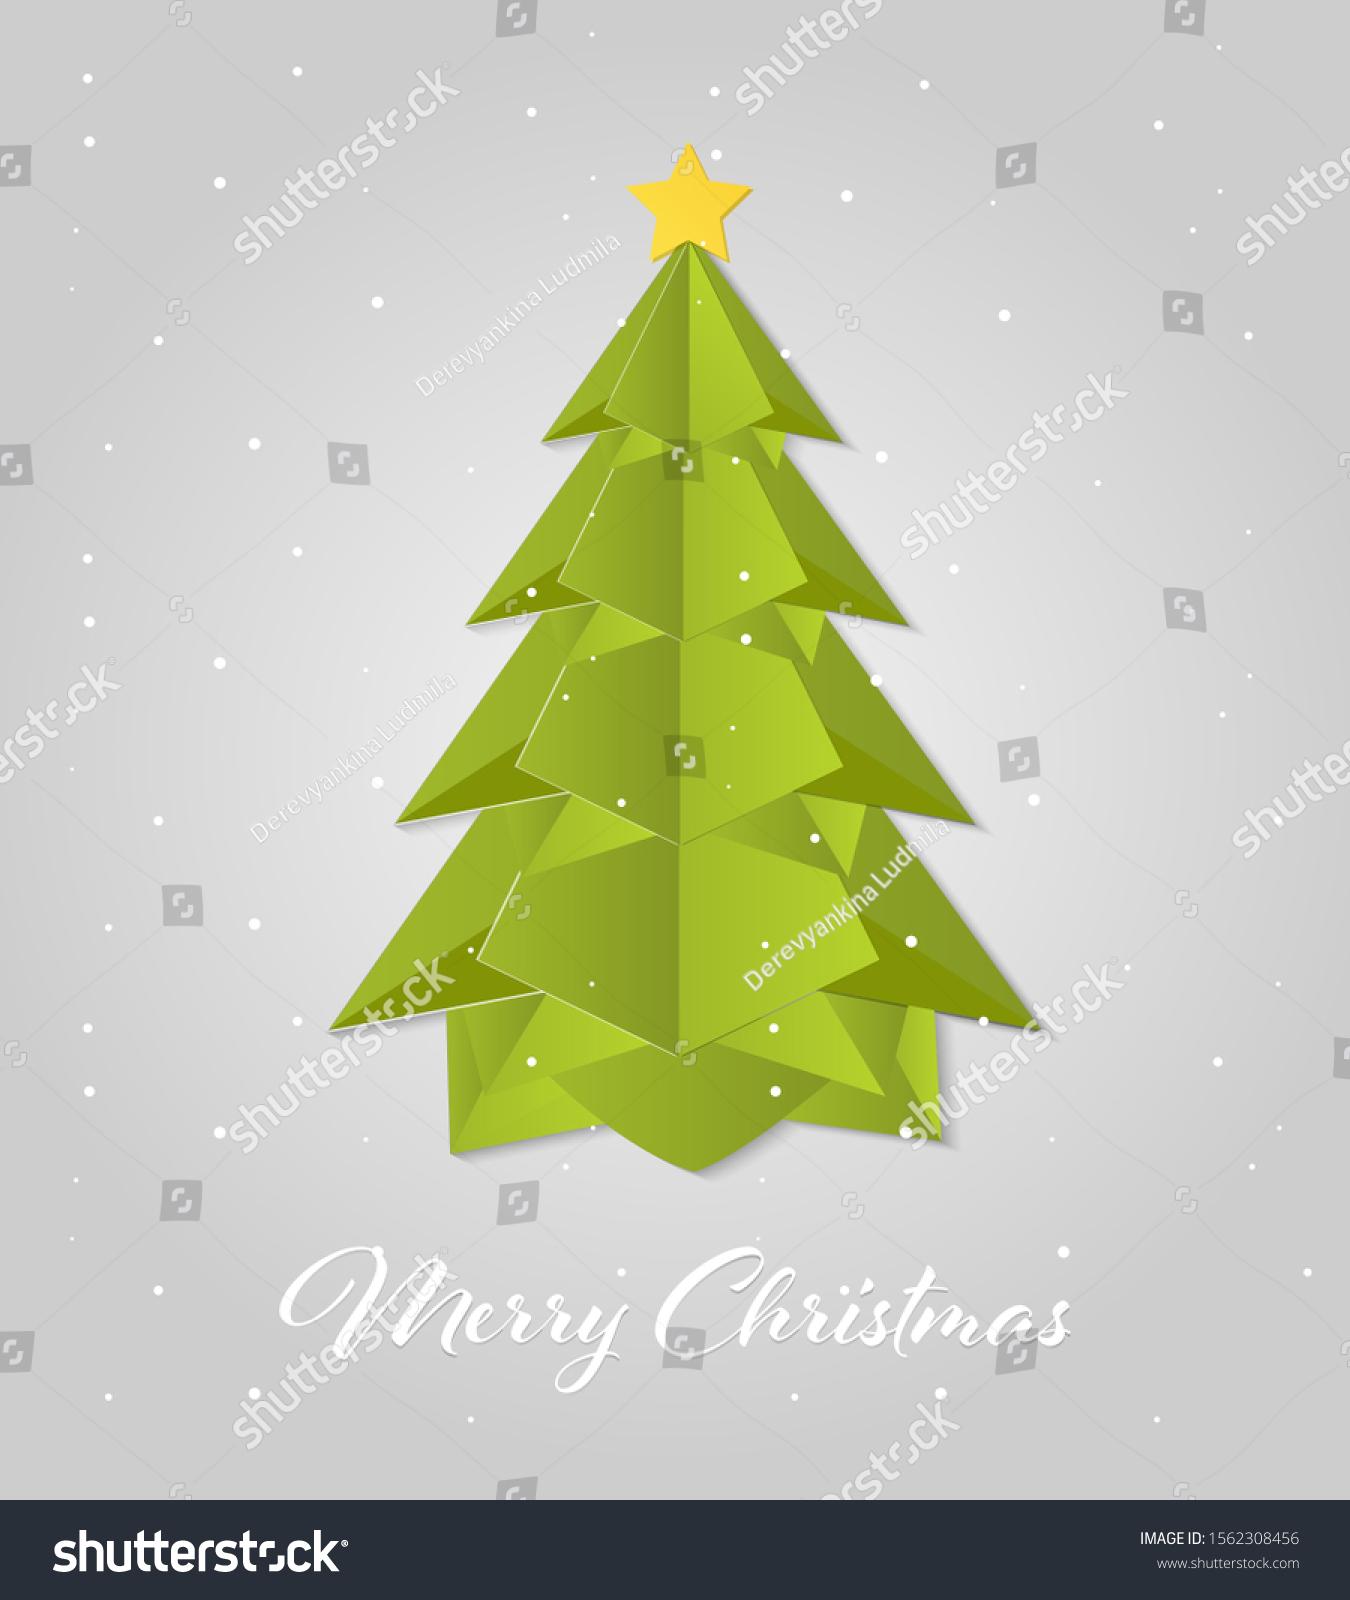 Paper Art Christmas Tree Merry Christmas Stock Vector Royalty Free 1562308456